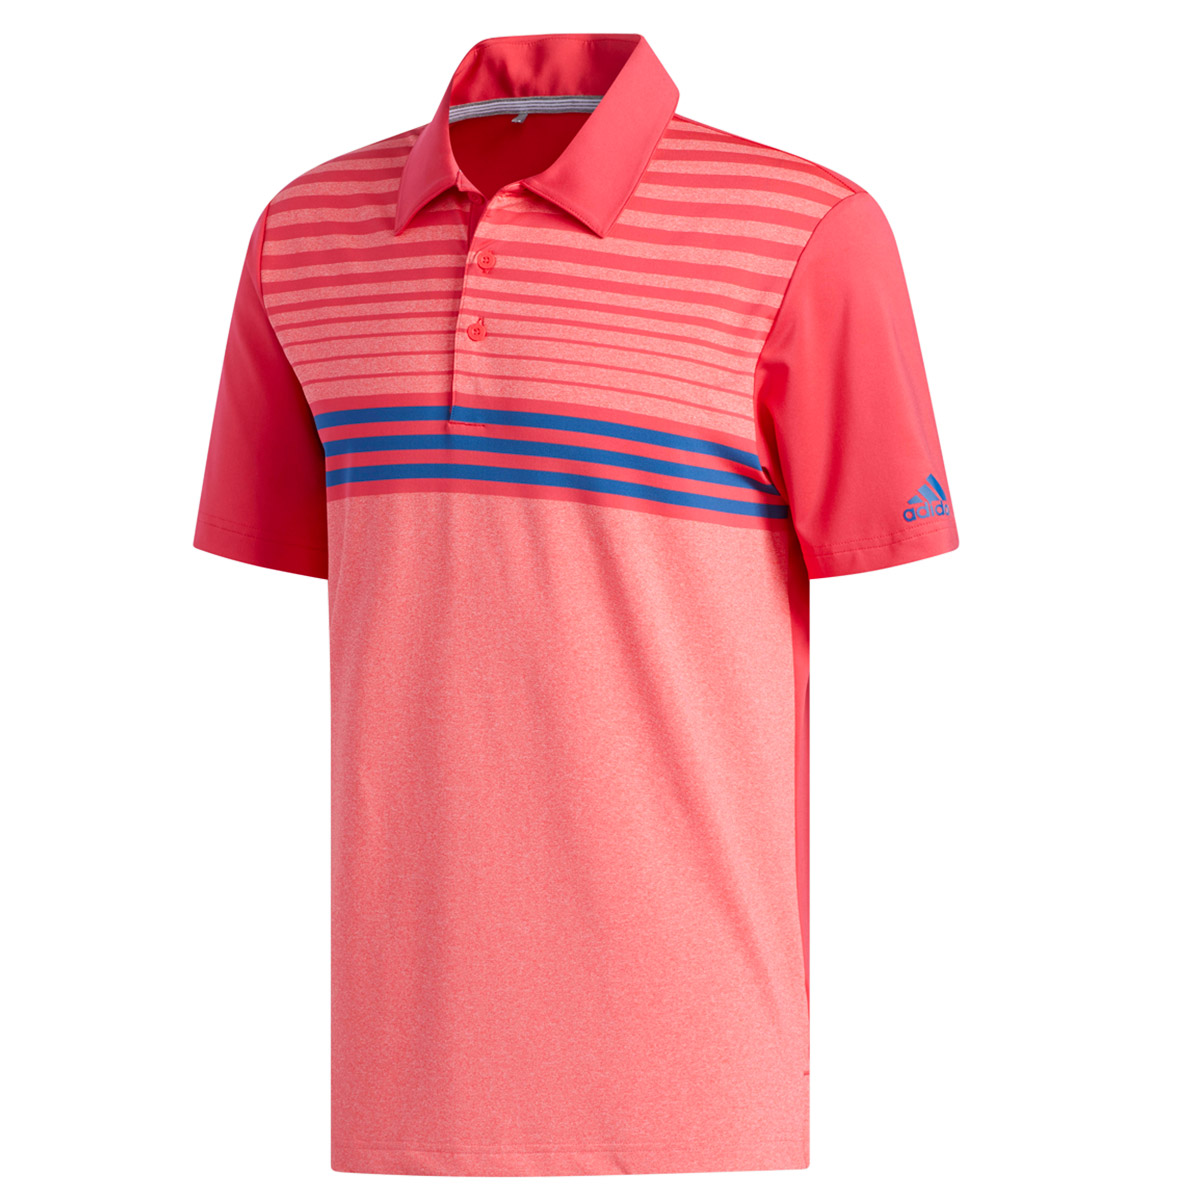 428e6578 adidas Golf Ultimate 365 3-Stripe Heather Polo Shirt | Online Golf